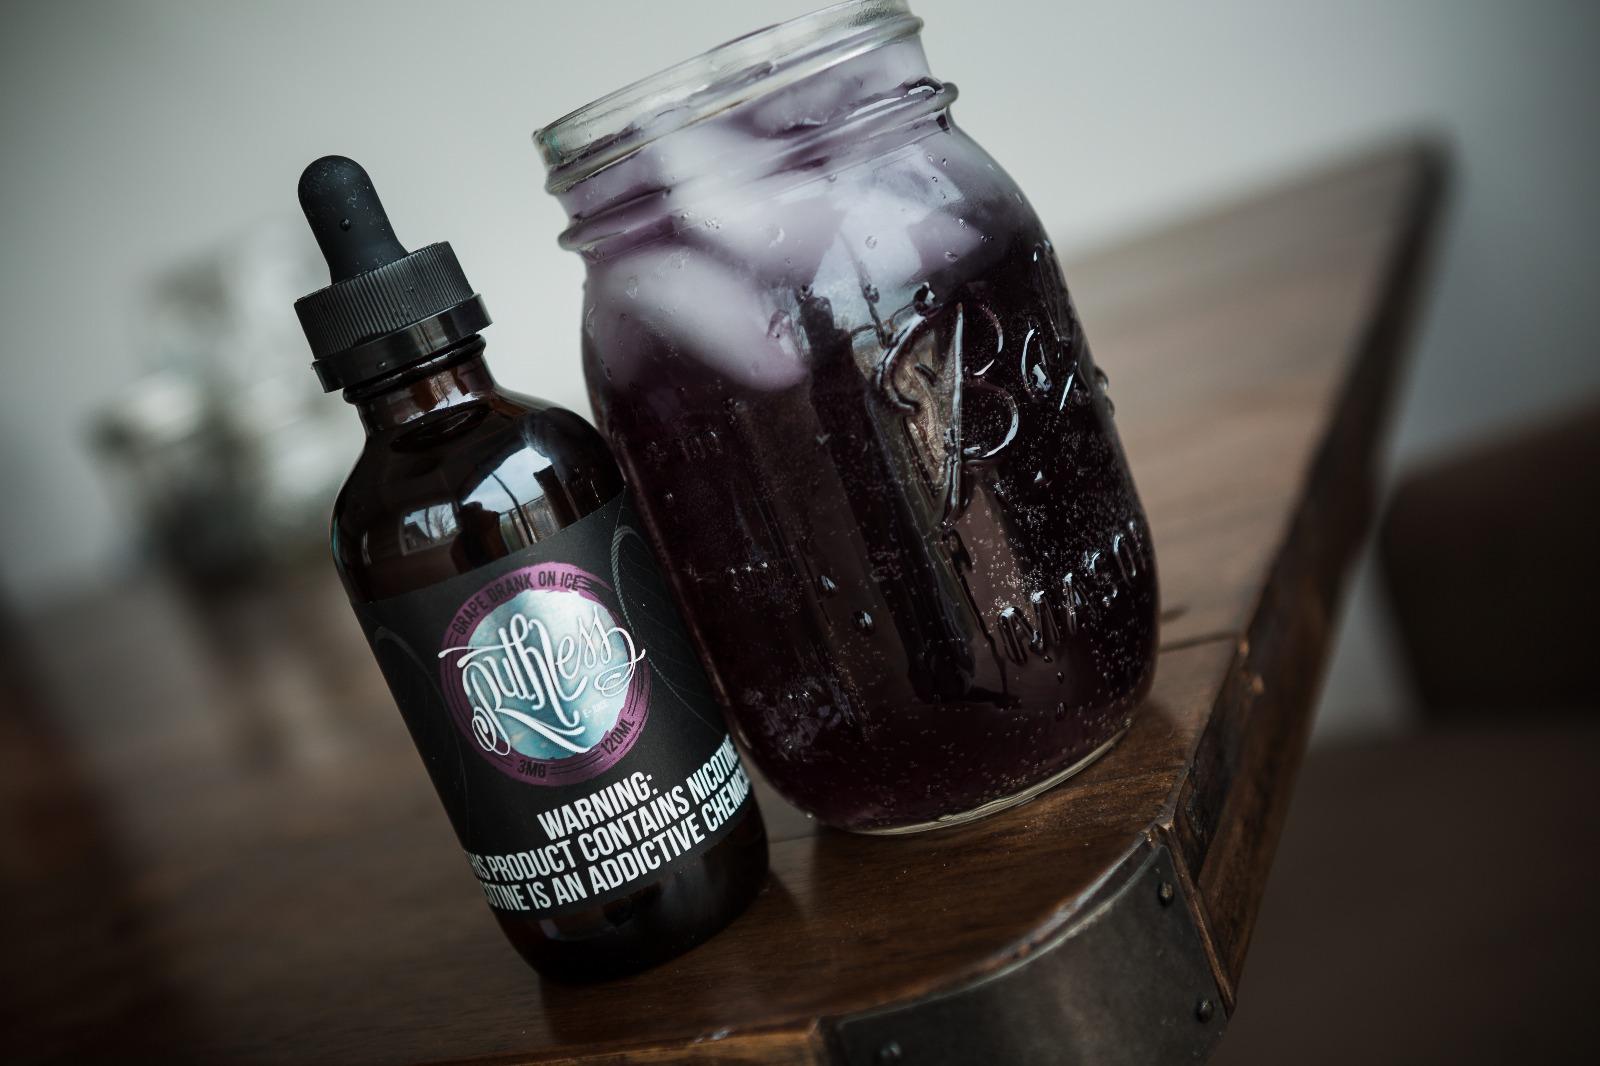 Grape Drank on Ice E-juice - Ruthless Vapor E-Liquids